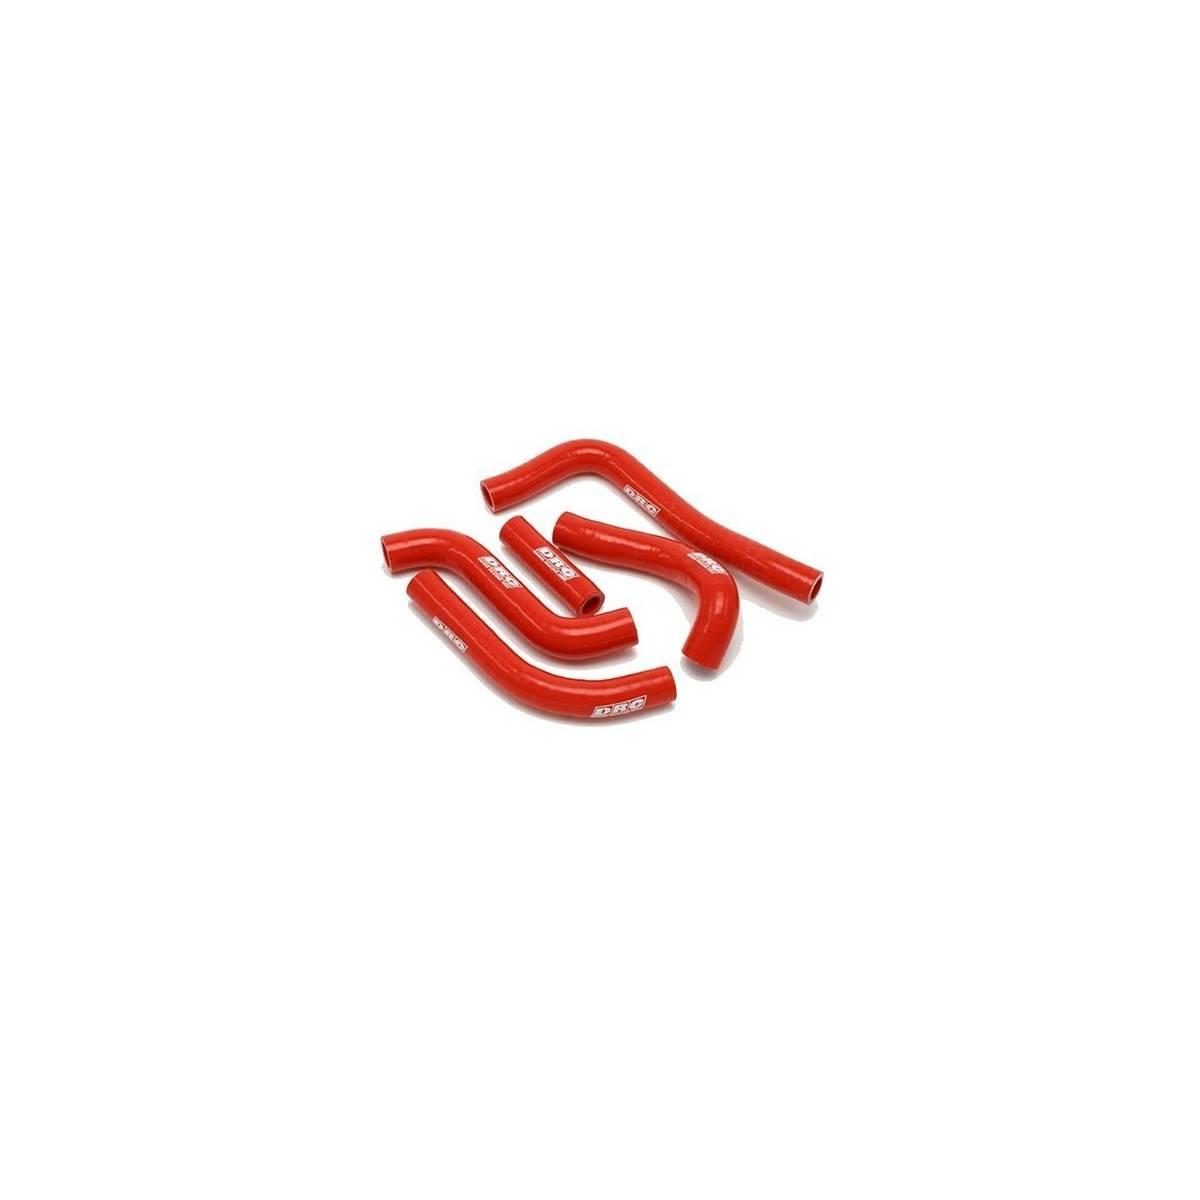 D47.01.103 - Kit Manguitos Radiador Honda Crf450R ´15 Rojo